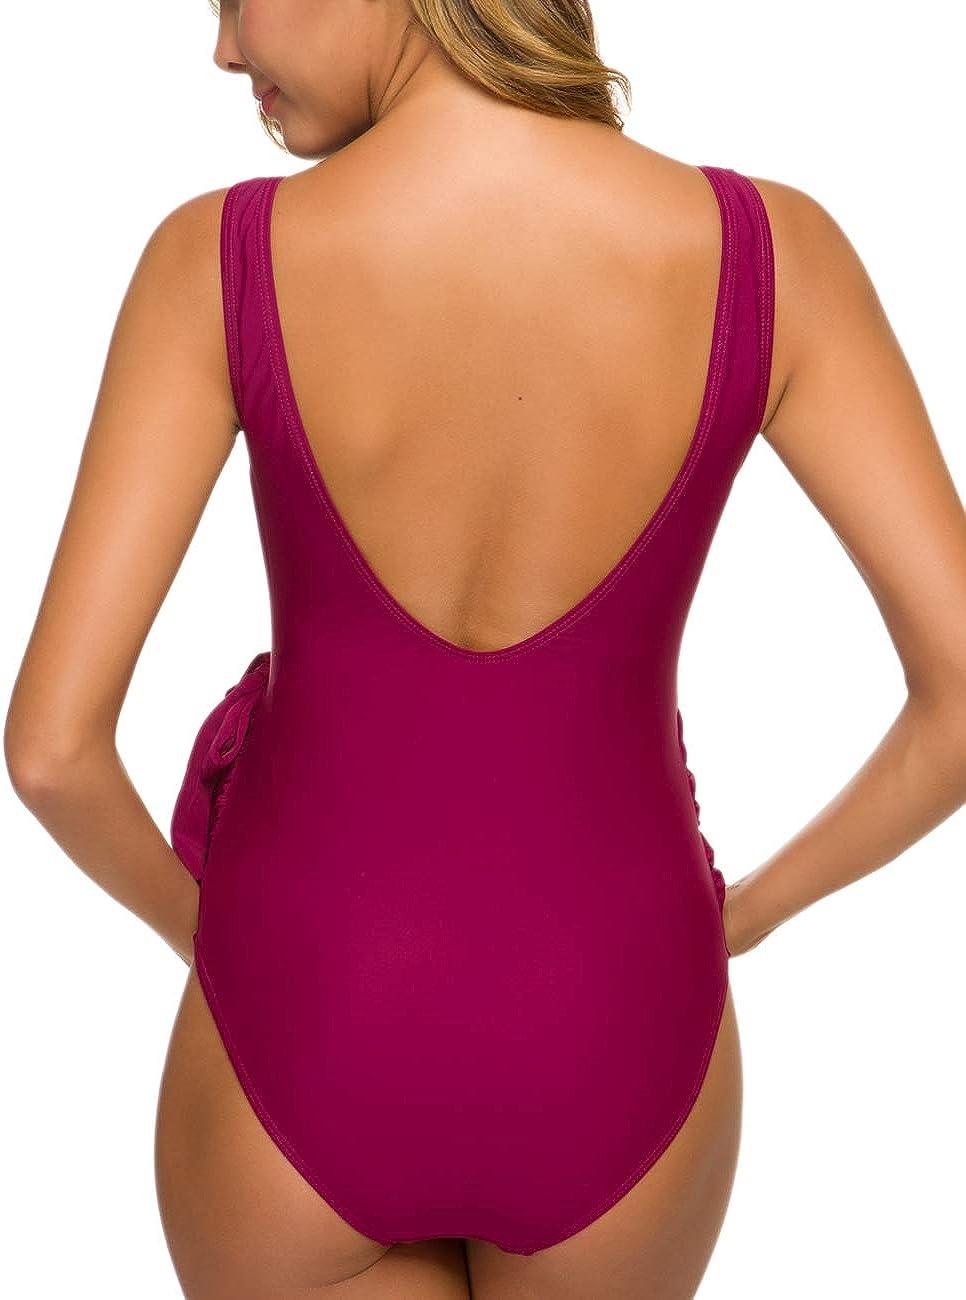 Maternity Swimsuit One Piece Tie Front Bathing Suit V Neck Pregnancy Swimwear High Cut Orange